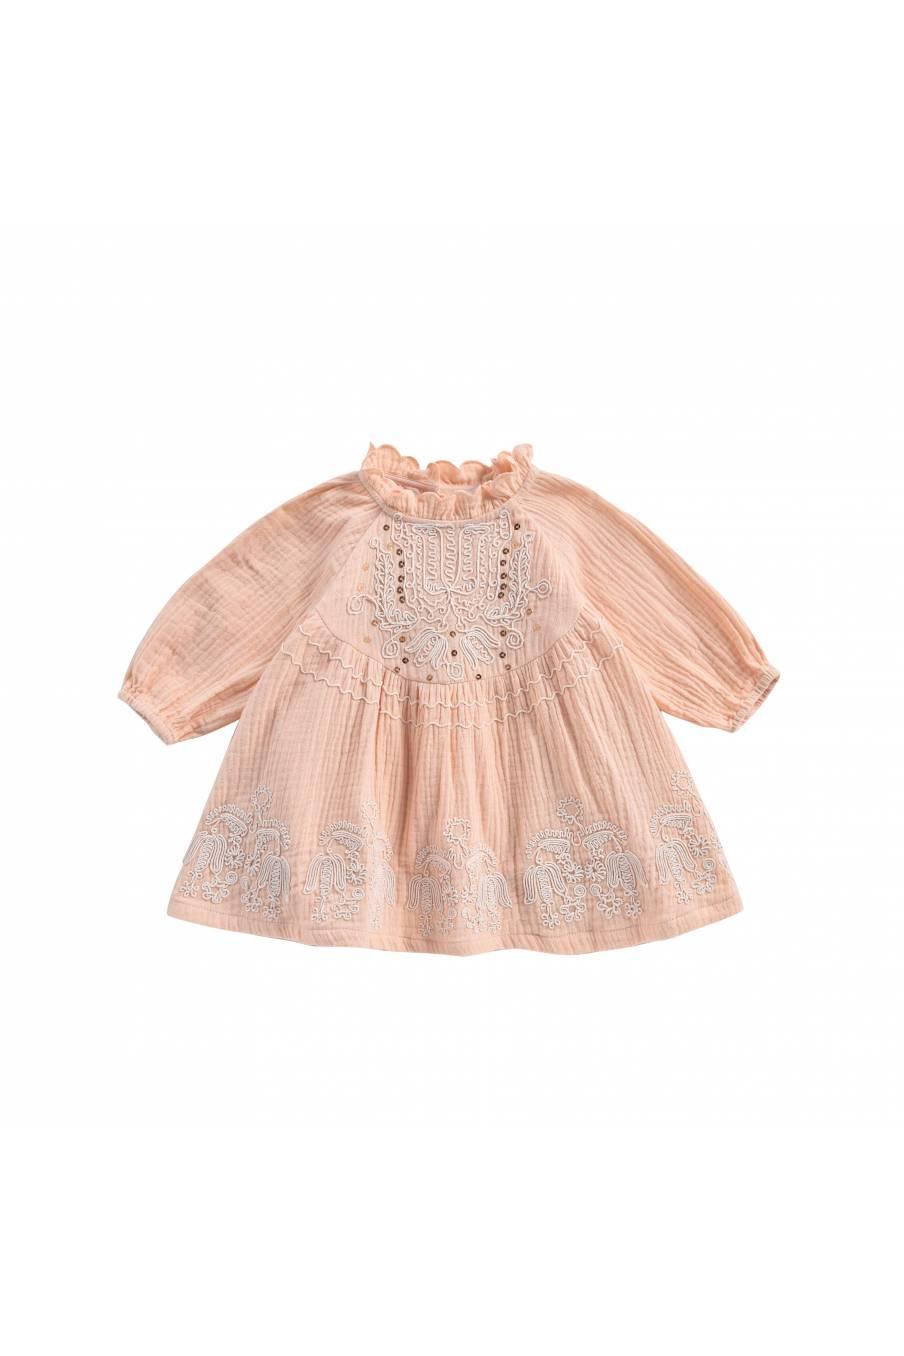 boheme chic vintage robe bébé fille suenna blush